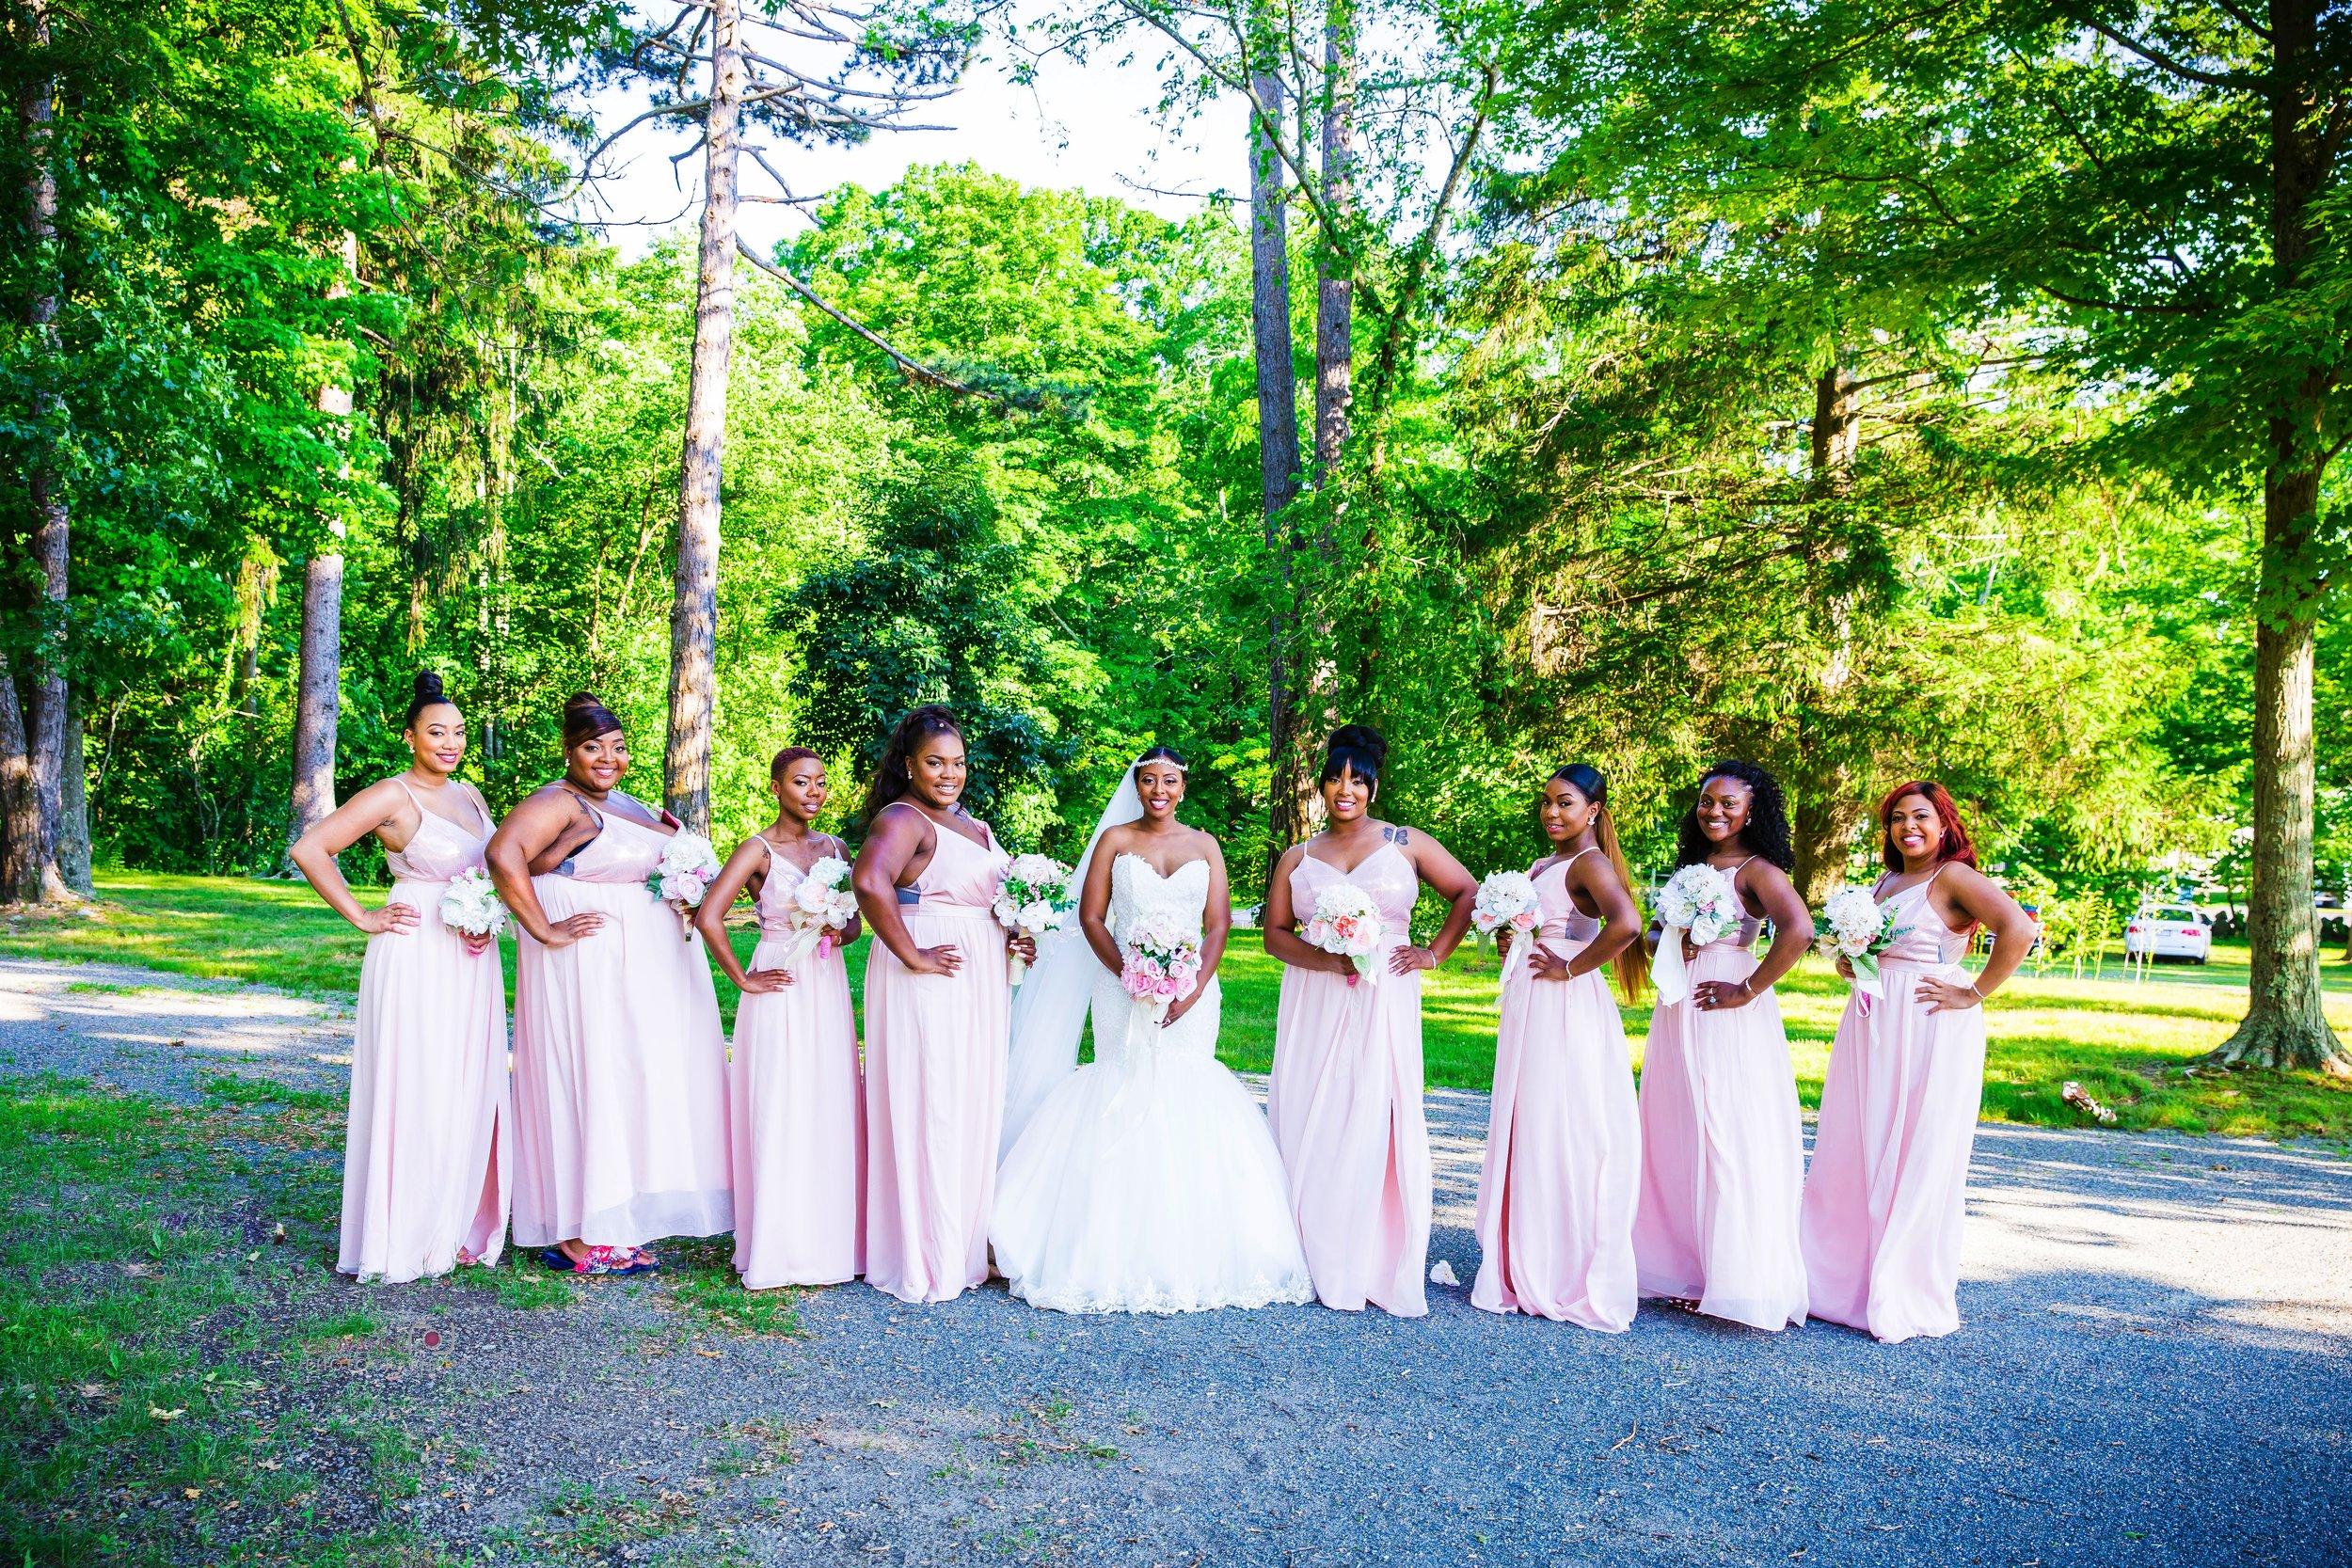 8C2A3622-Giovanni The Photographer-Best Boston Wedding Photography-Randolph Elks 2130 WM50.jpg